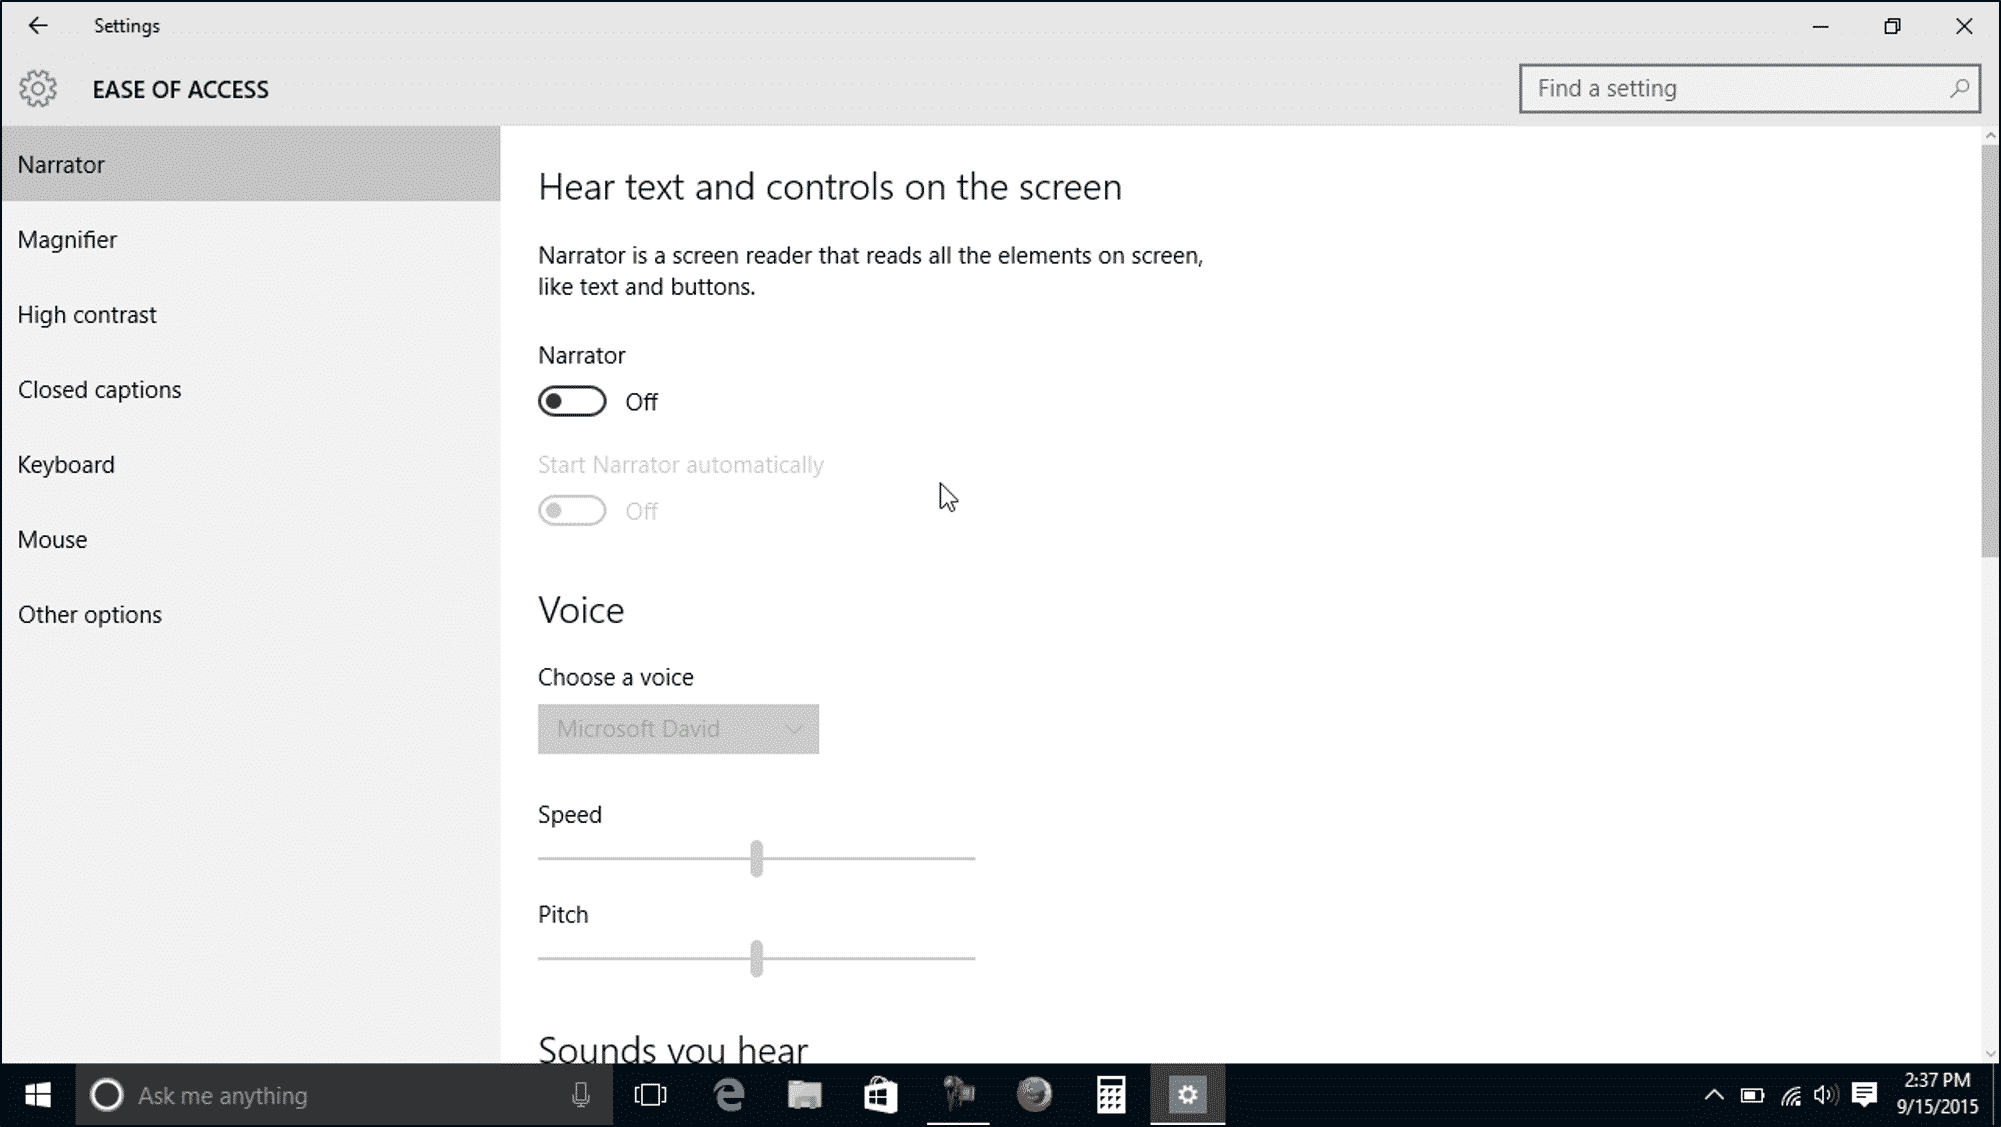 Narrator Settings in Windows 10 - Instructions - TeachUcomp